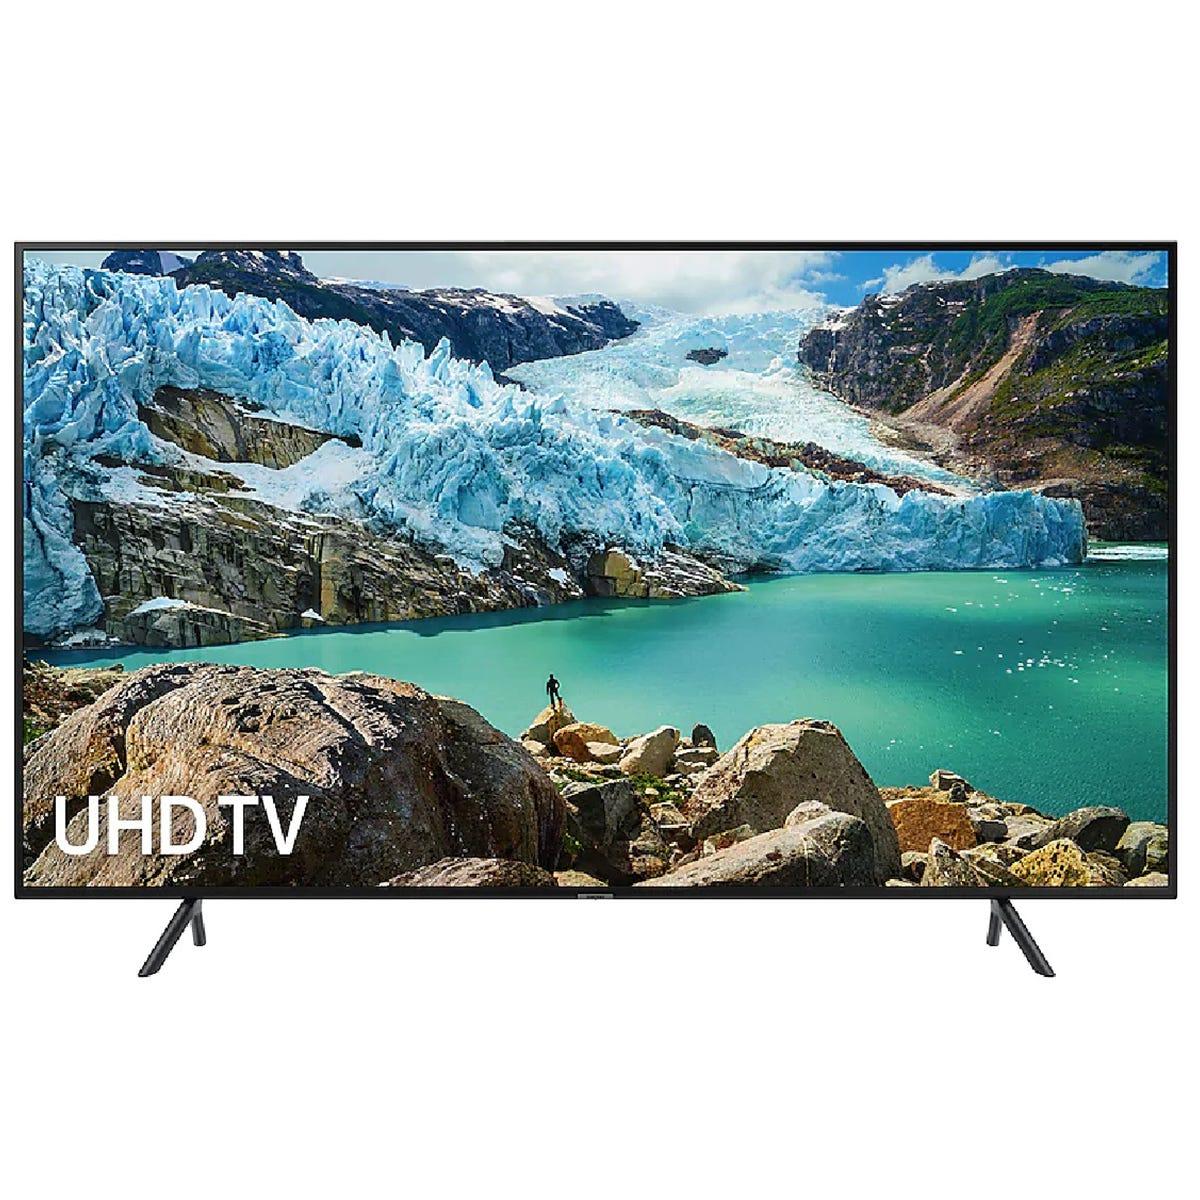 Samsung UE55RU7100 (2019) HDR 4K Ultra HD Smart TV, 55 with TVPlus & Apple TV App, Charcoal Black